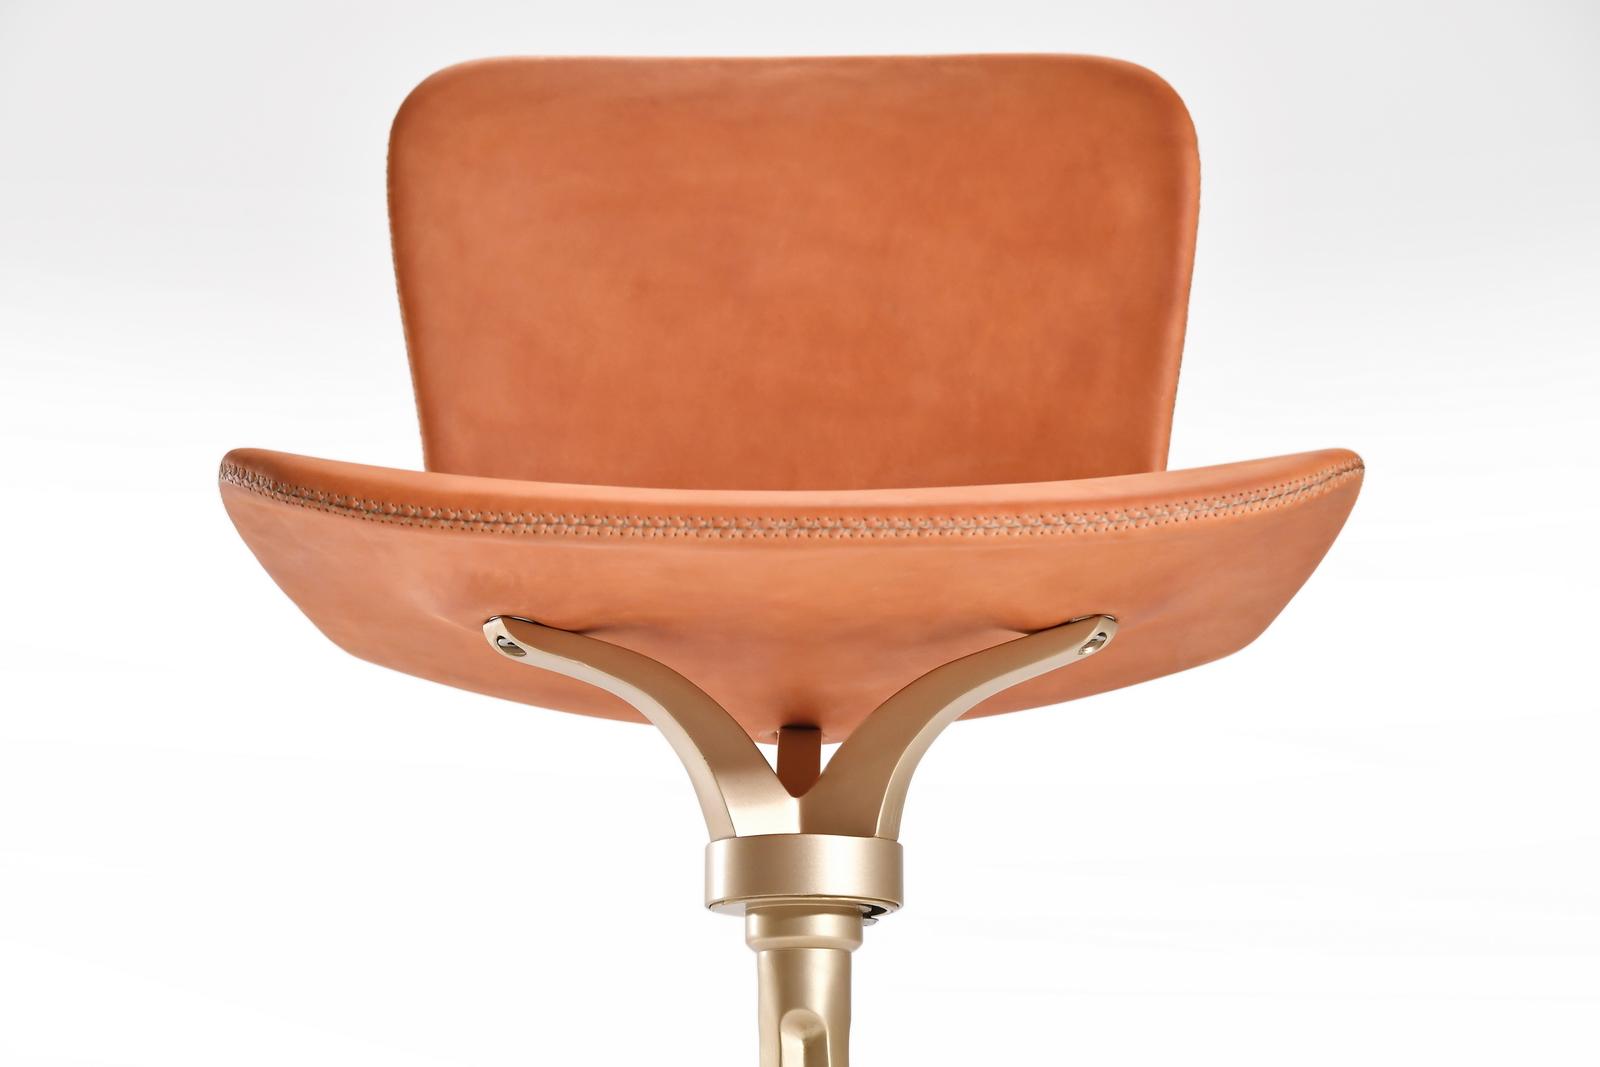 PTendercool-Chair-PT472-BS1-LB-210325-05